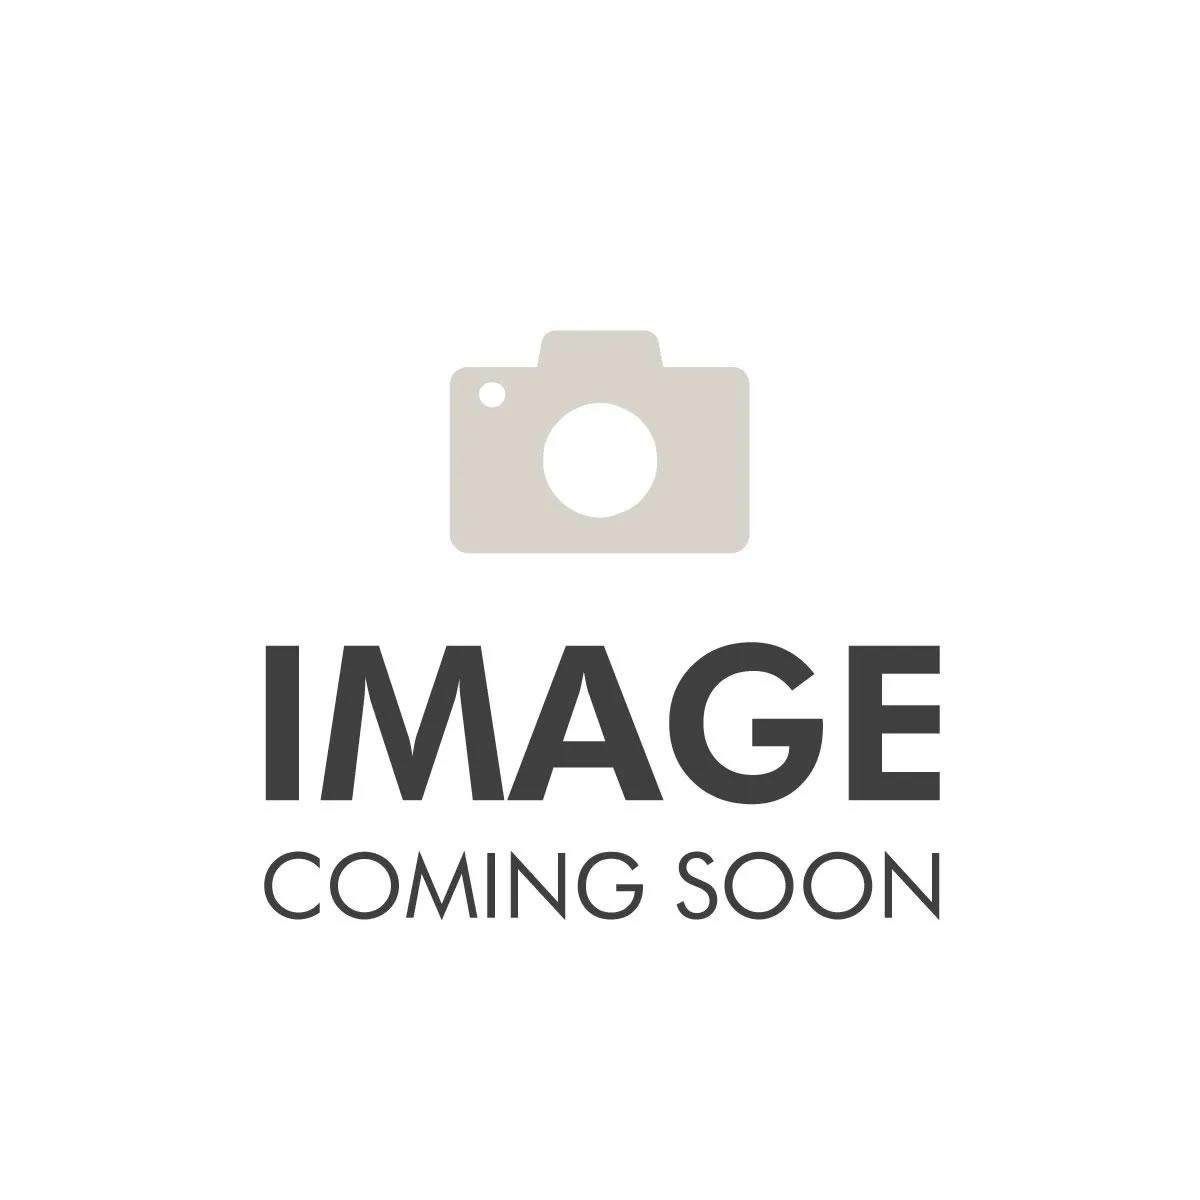 Wheel Center Cap, for 17x9 Rugged Ridge Wheels